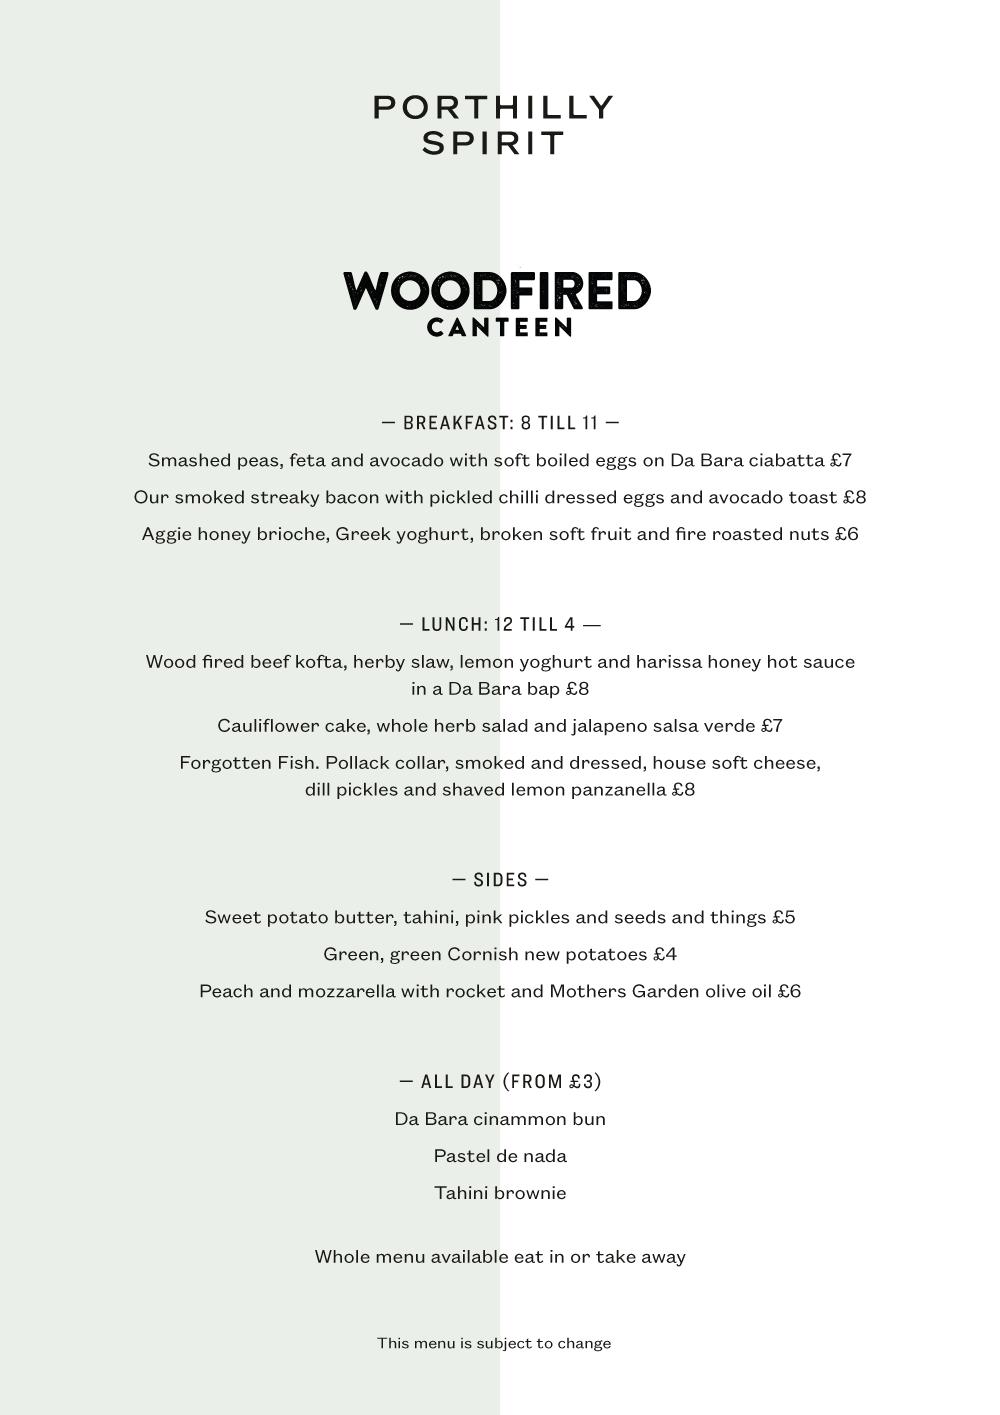 woodfired-canteen-menu_v2.png